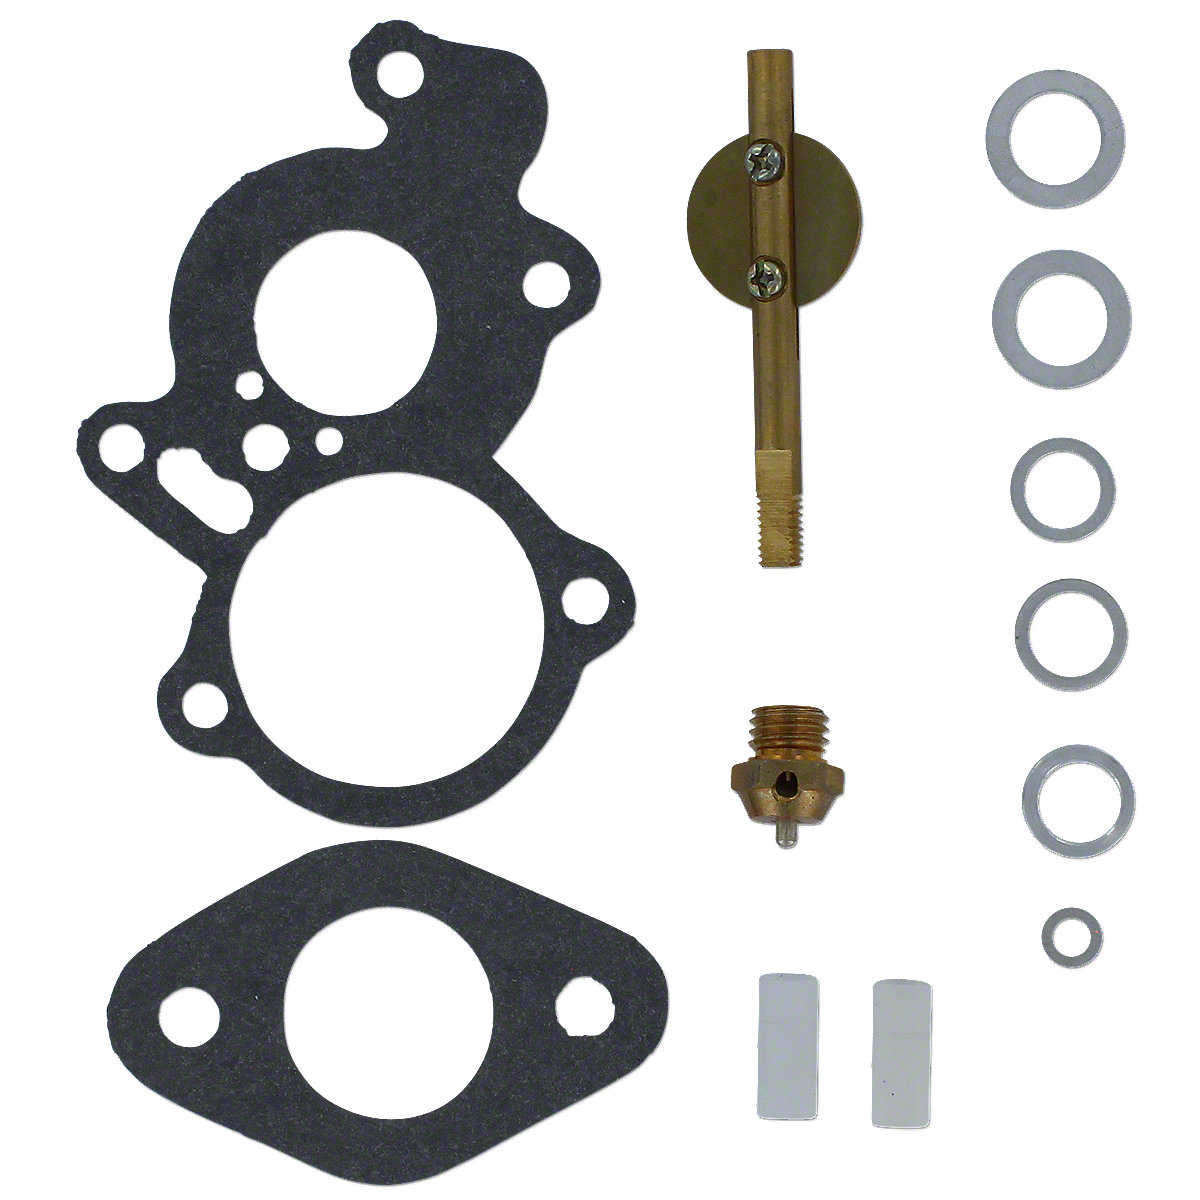 Basic Carburetor Kit For Massey Ferguson:  TEA20 (with British Zenith Carburetor (80 And 85 M.m. Engines)); Replaces: British Zenith Number: 24T2, 1201, 1264.